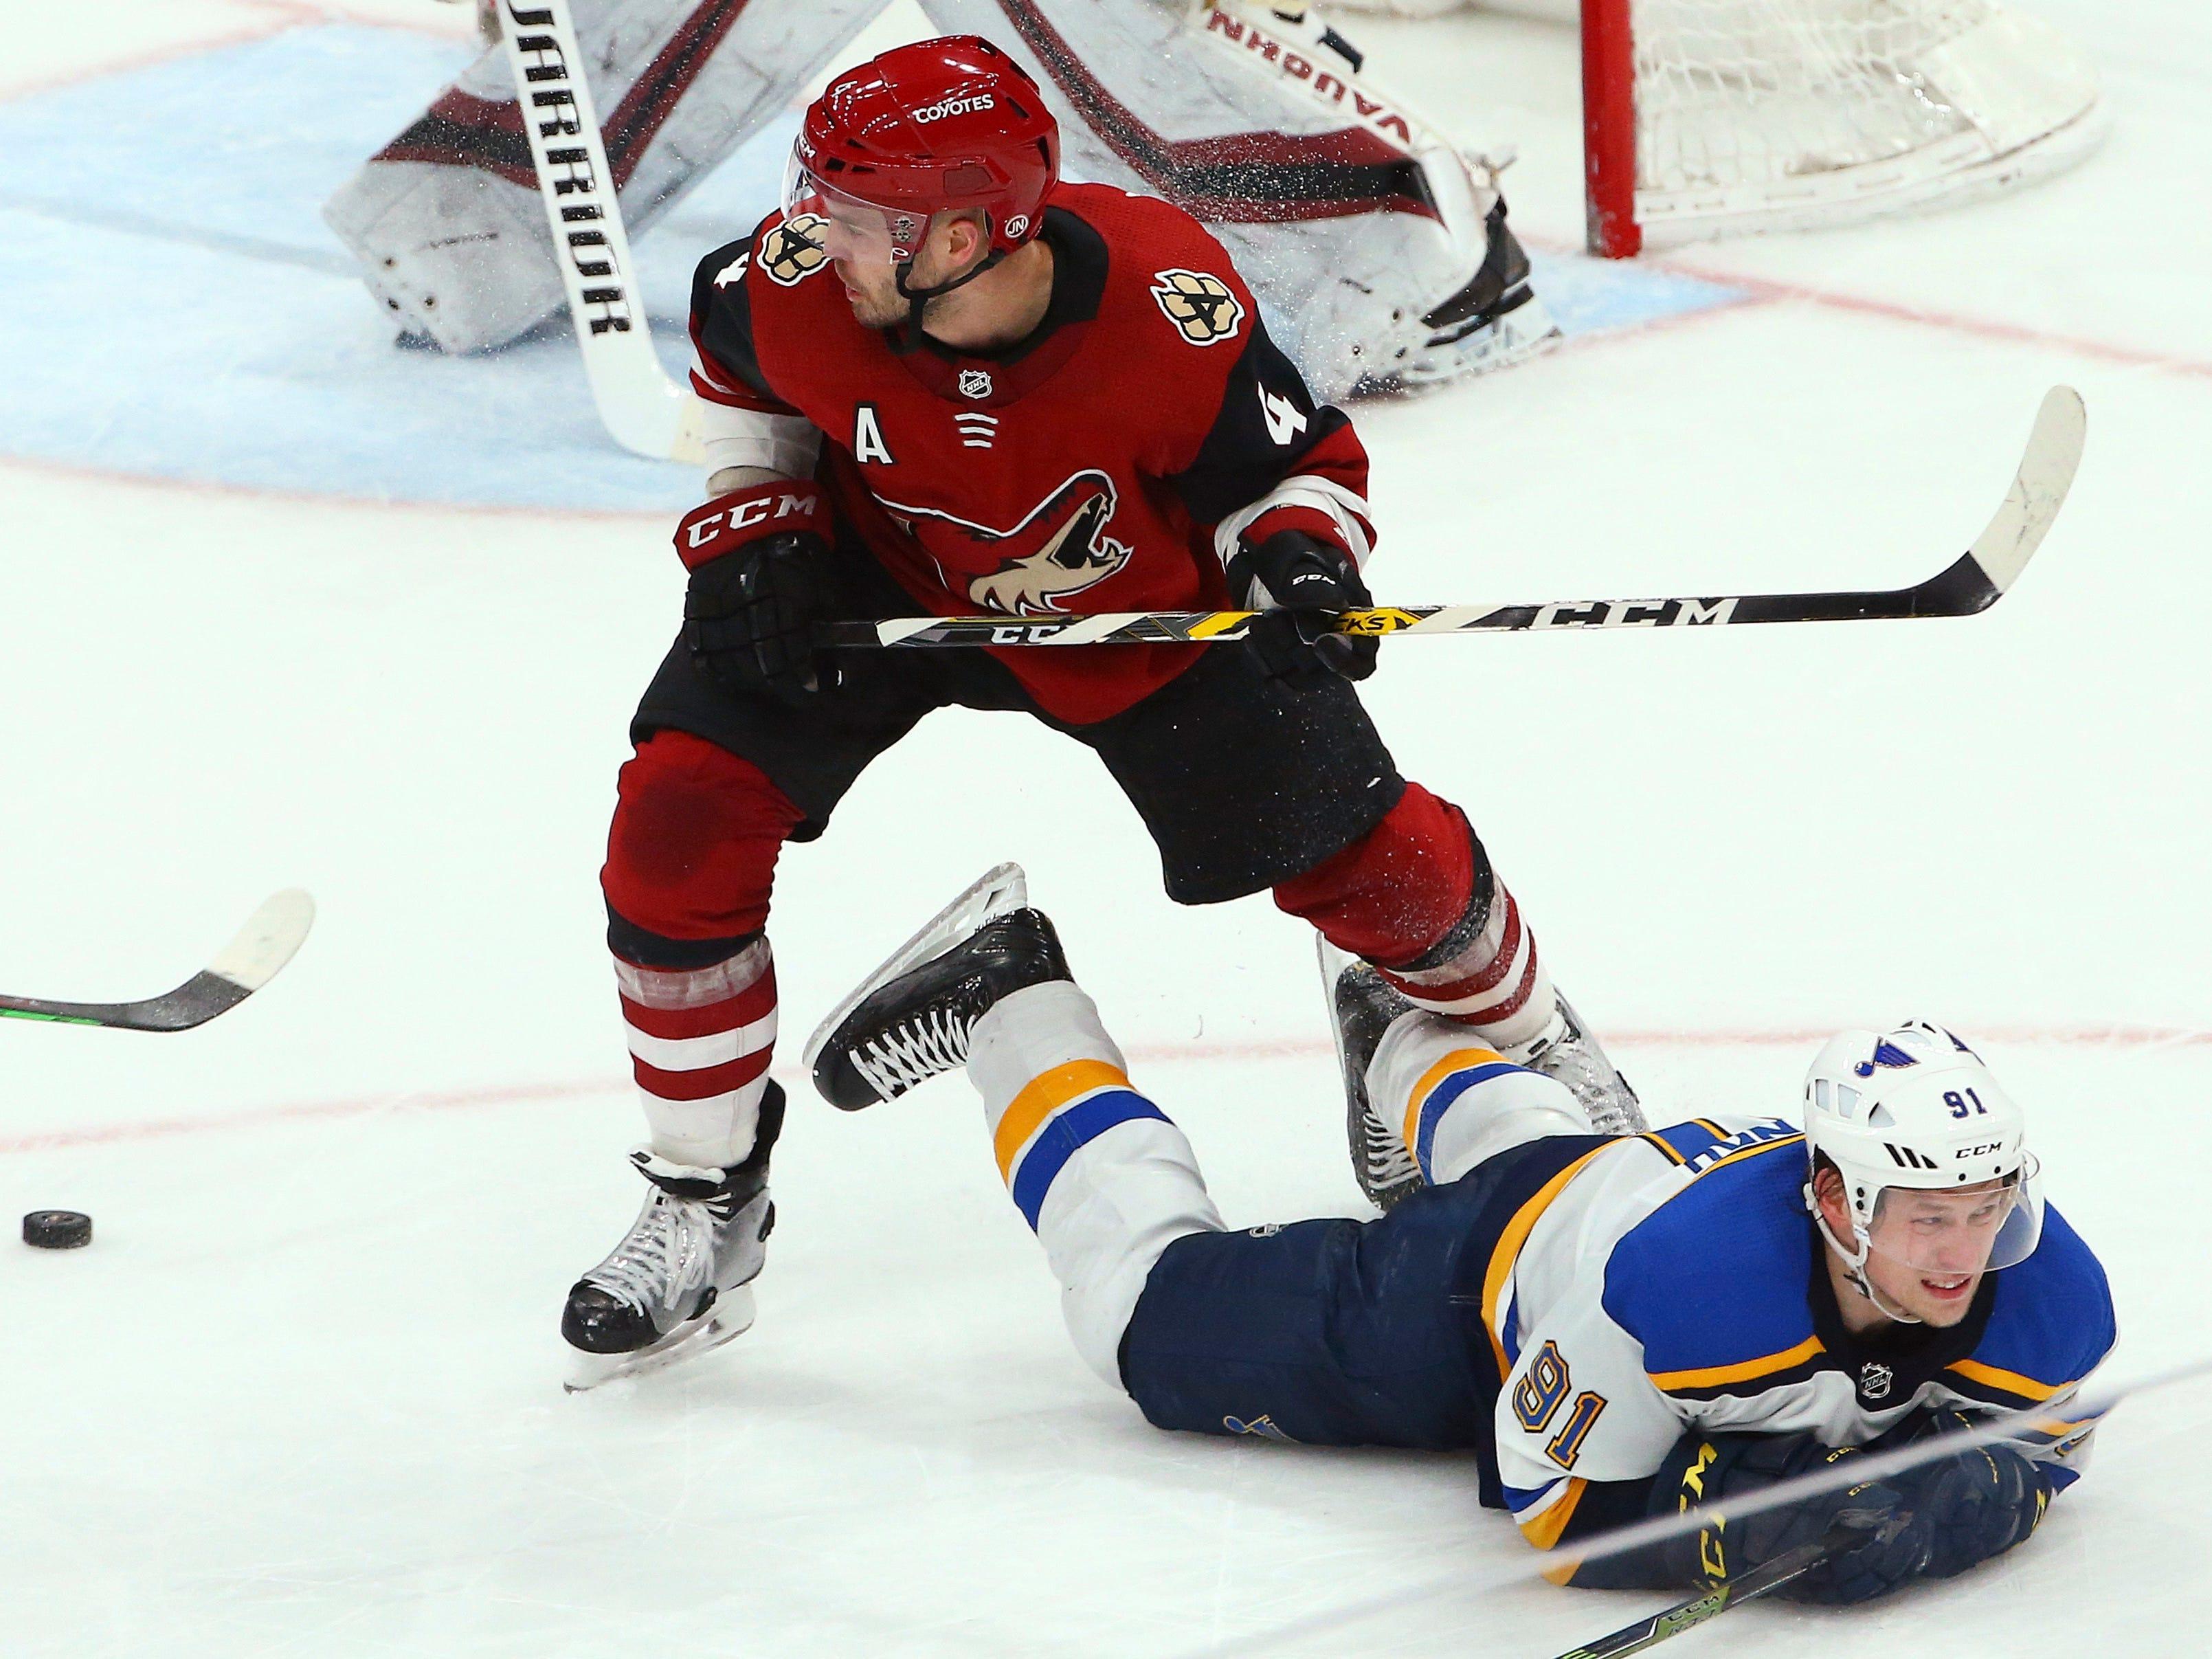 Arizona Coyotes defenseman Niklas Hjalmarsson (4) sends St. Louis Blues right wing Vladimir Tarasenko (91) to the ice during the second period of an NHL hockey game Thursday, Feb. 14, 2019, in Glendale, Ariz.